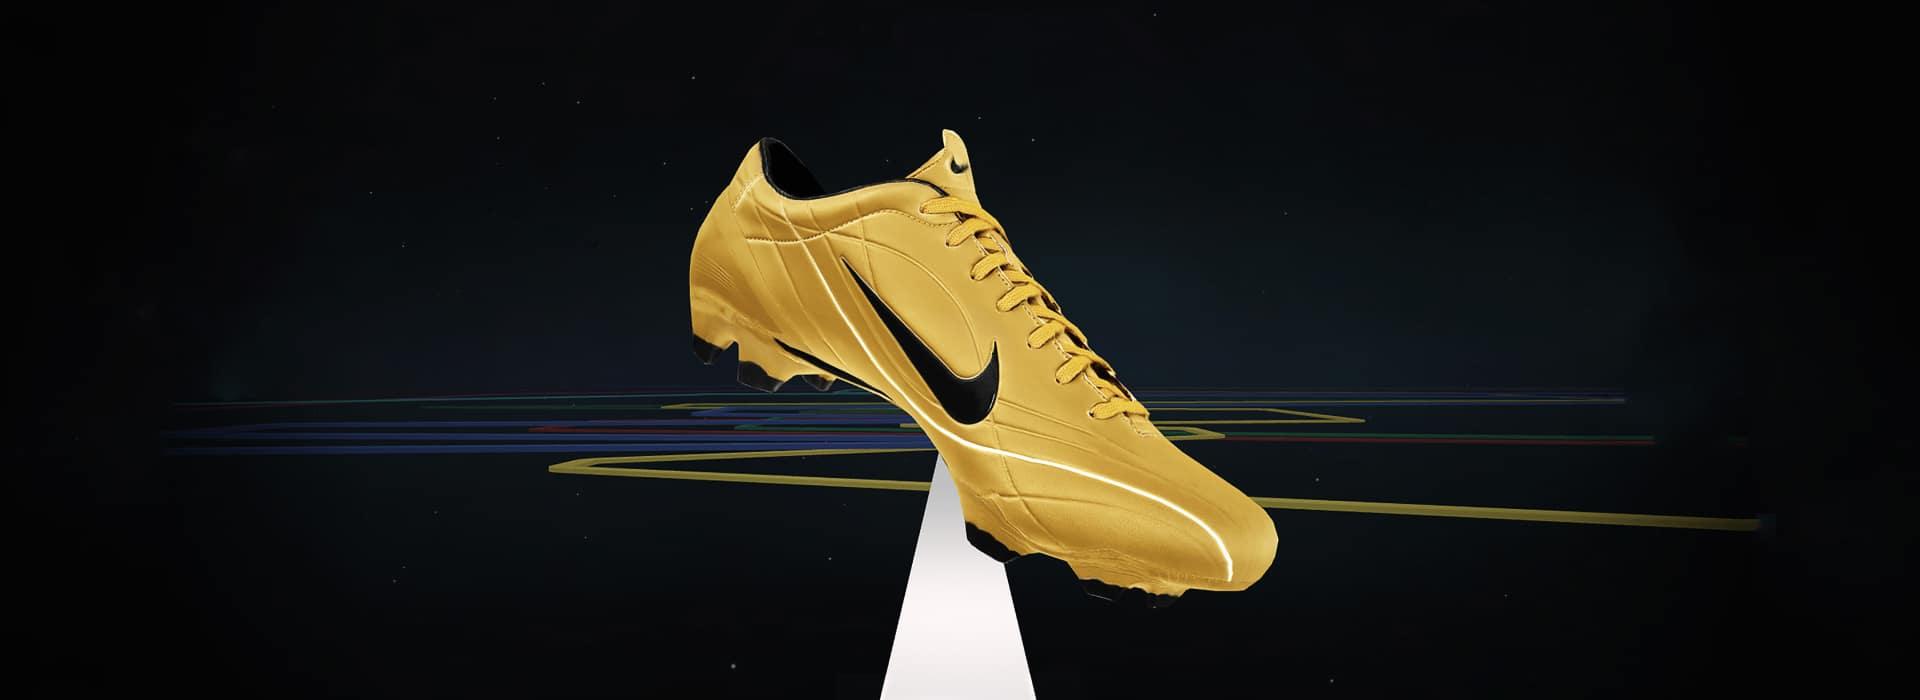 Speed Rga Innovation Genealogy At Transformation Of Nike az6xPq